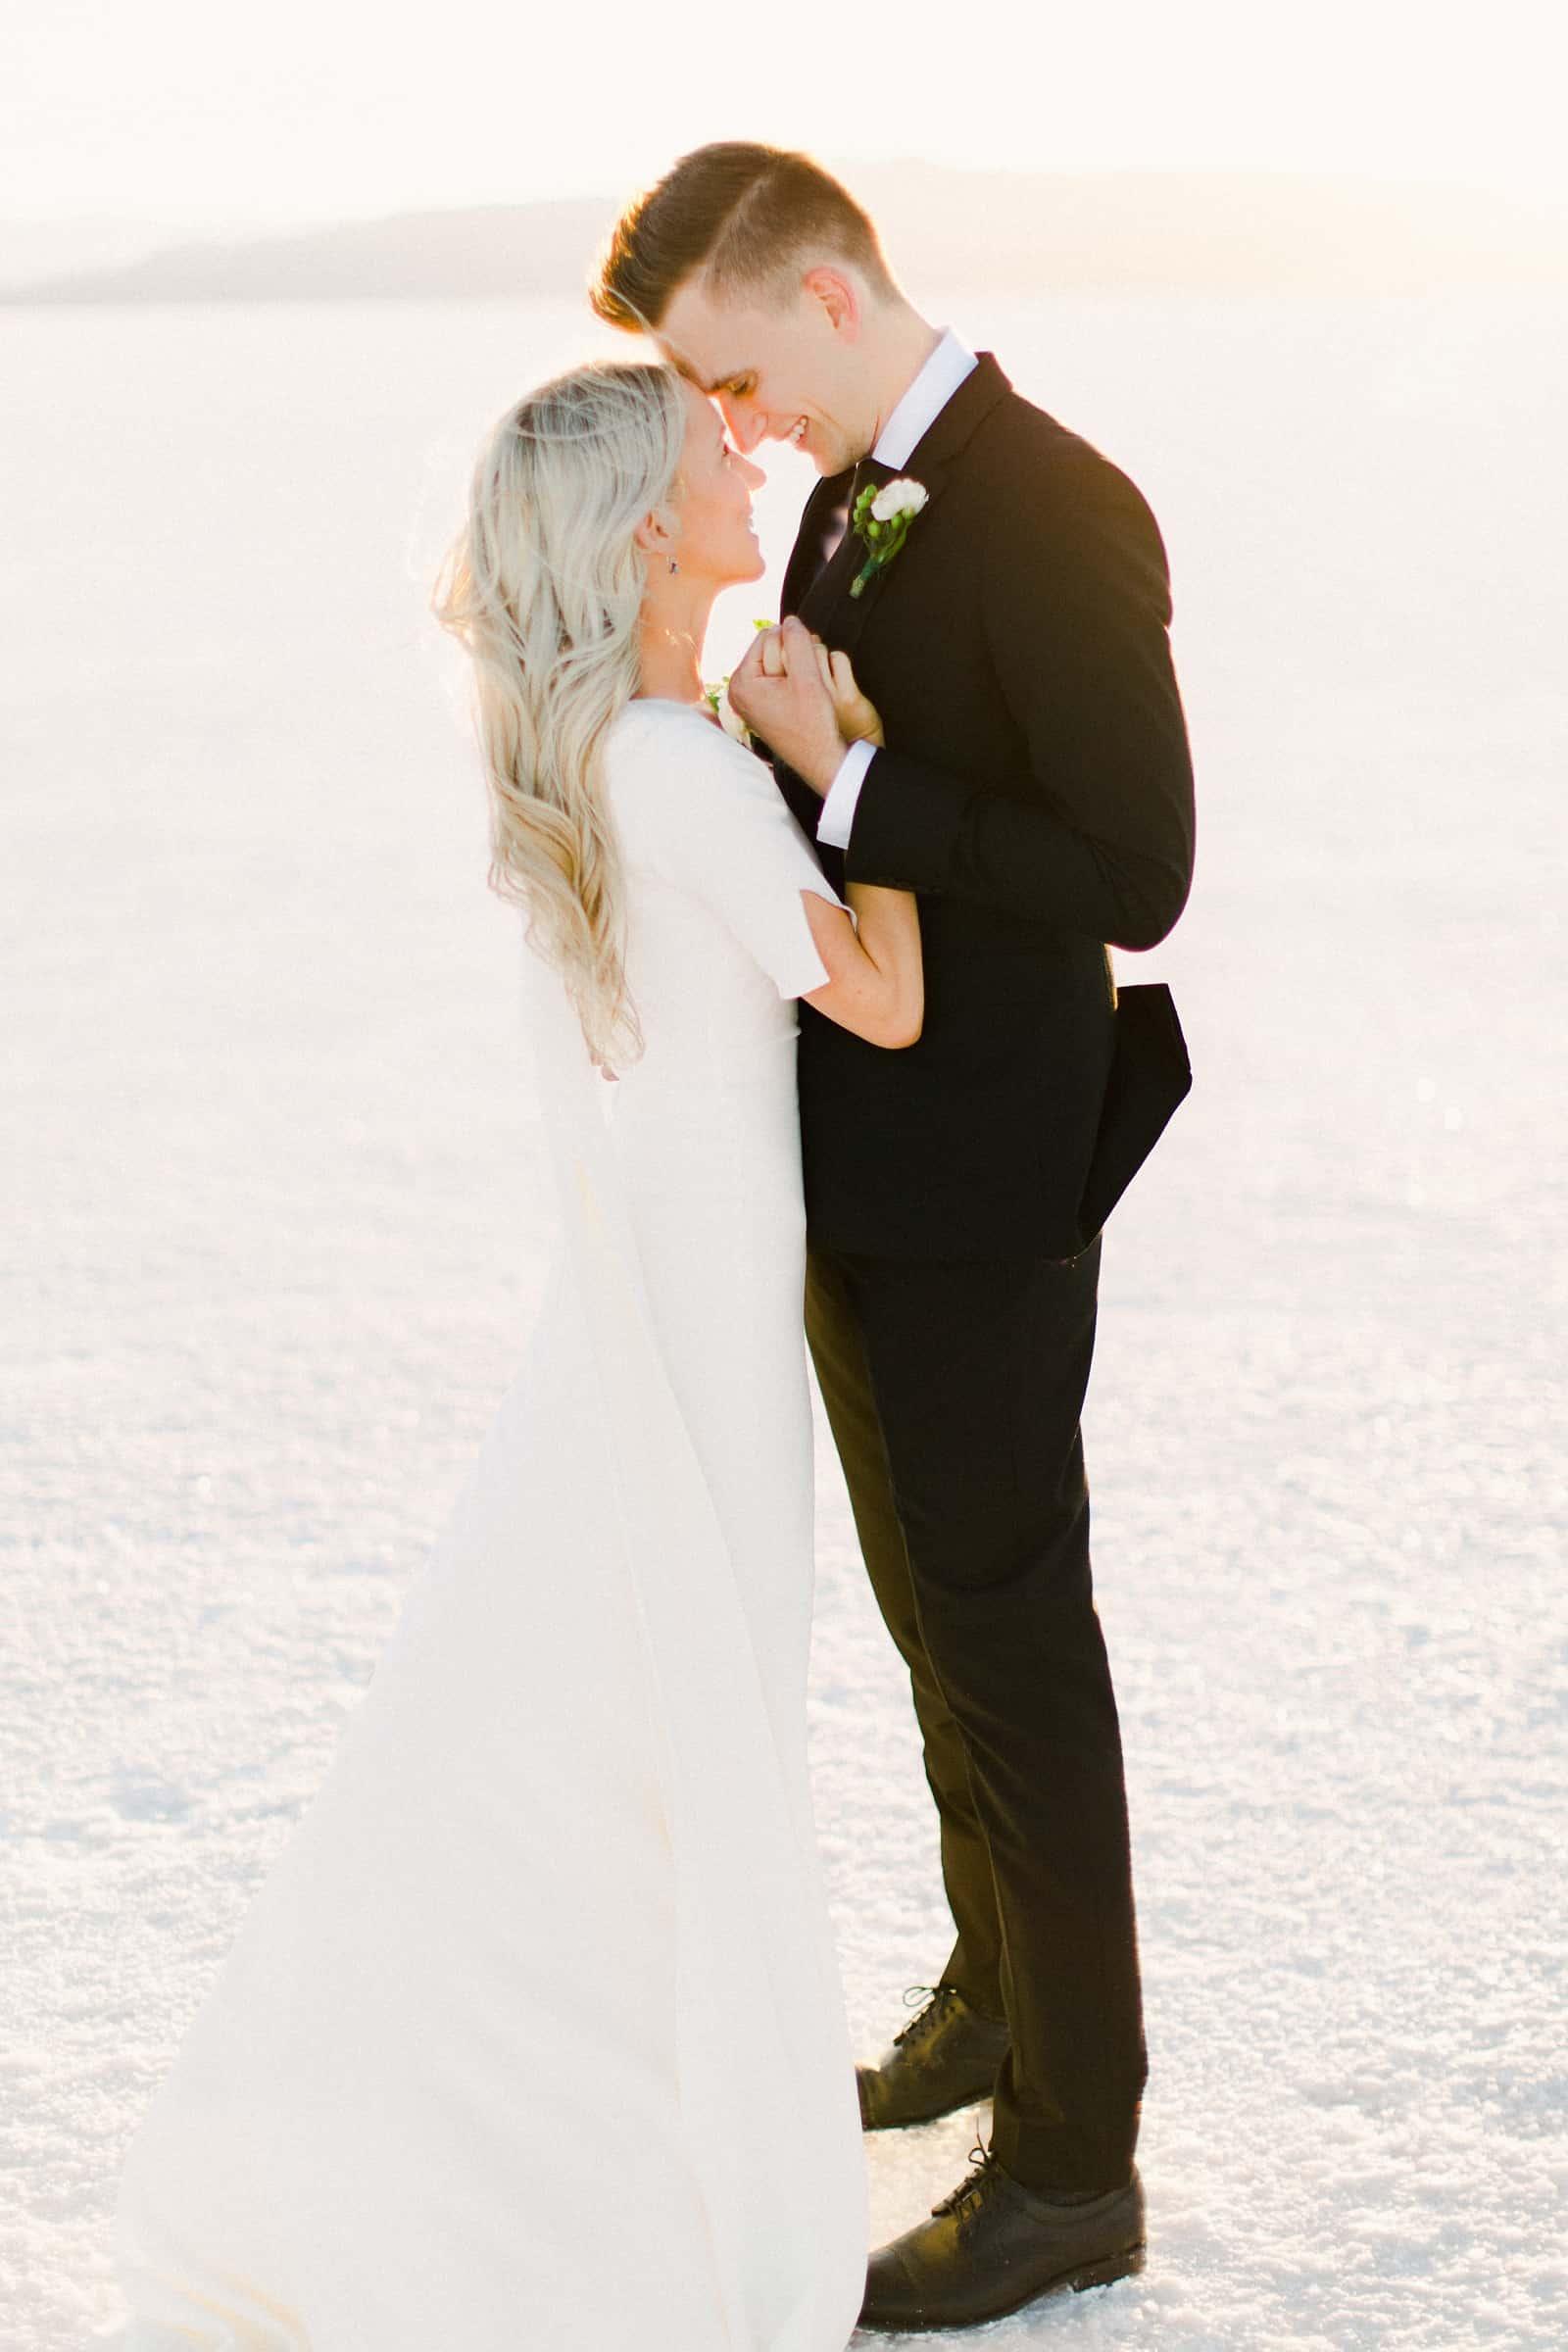 Bonneville Salt Flats Utah Wedding Photography, destination wedding, bride and groom first look, pose for wedding couple